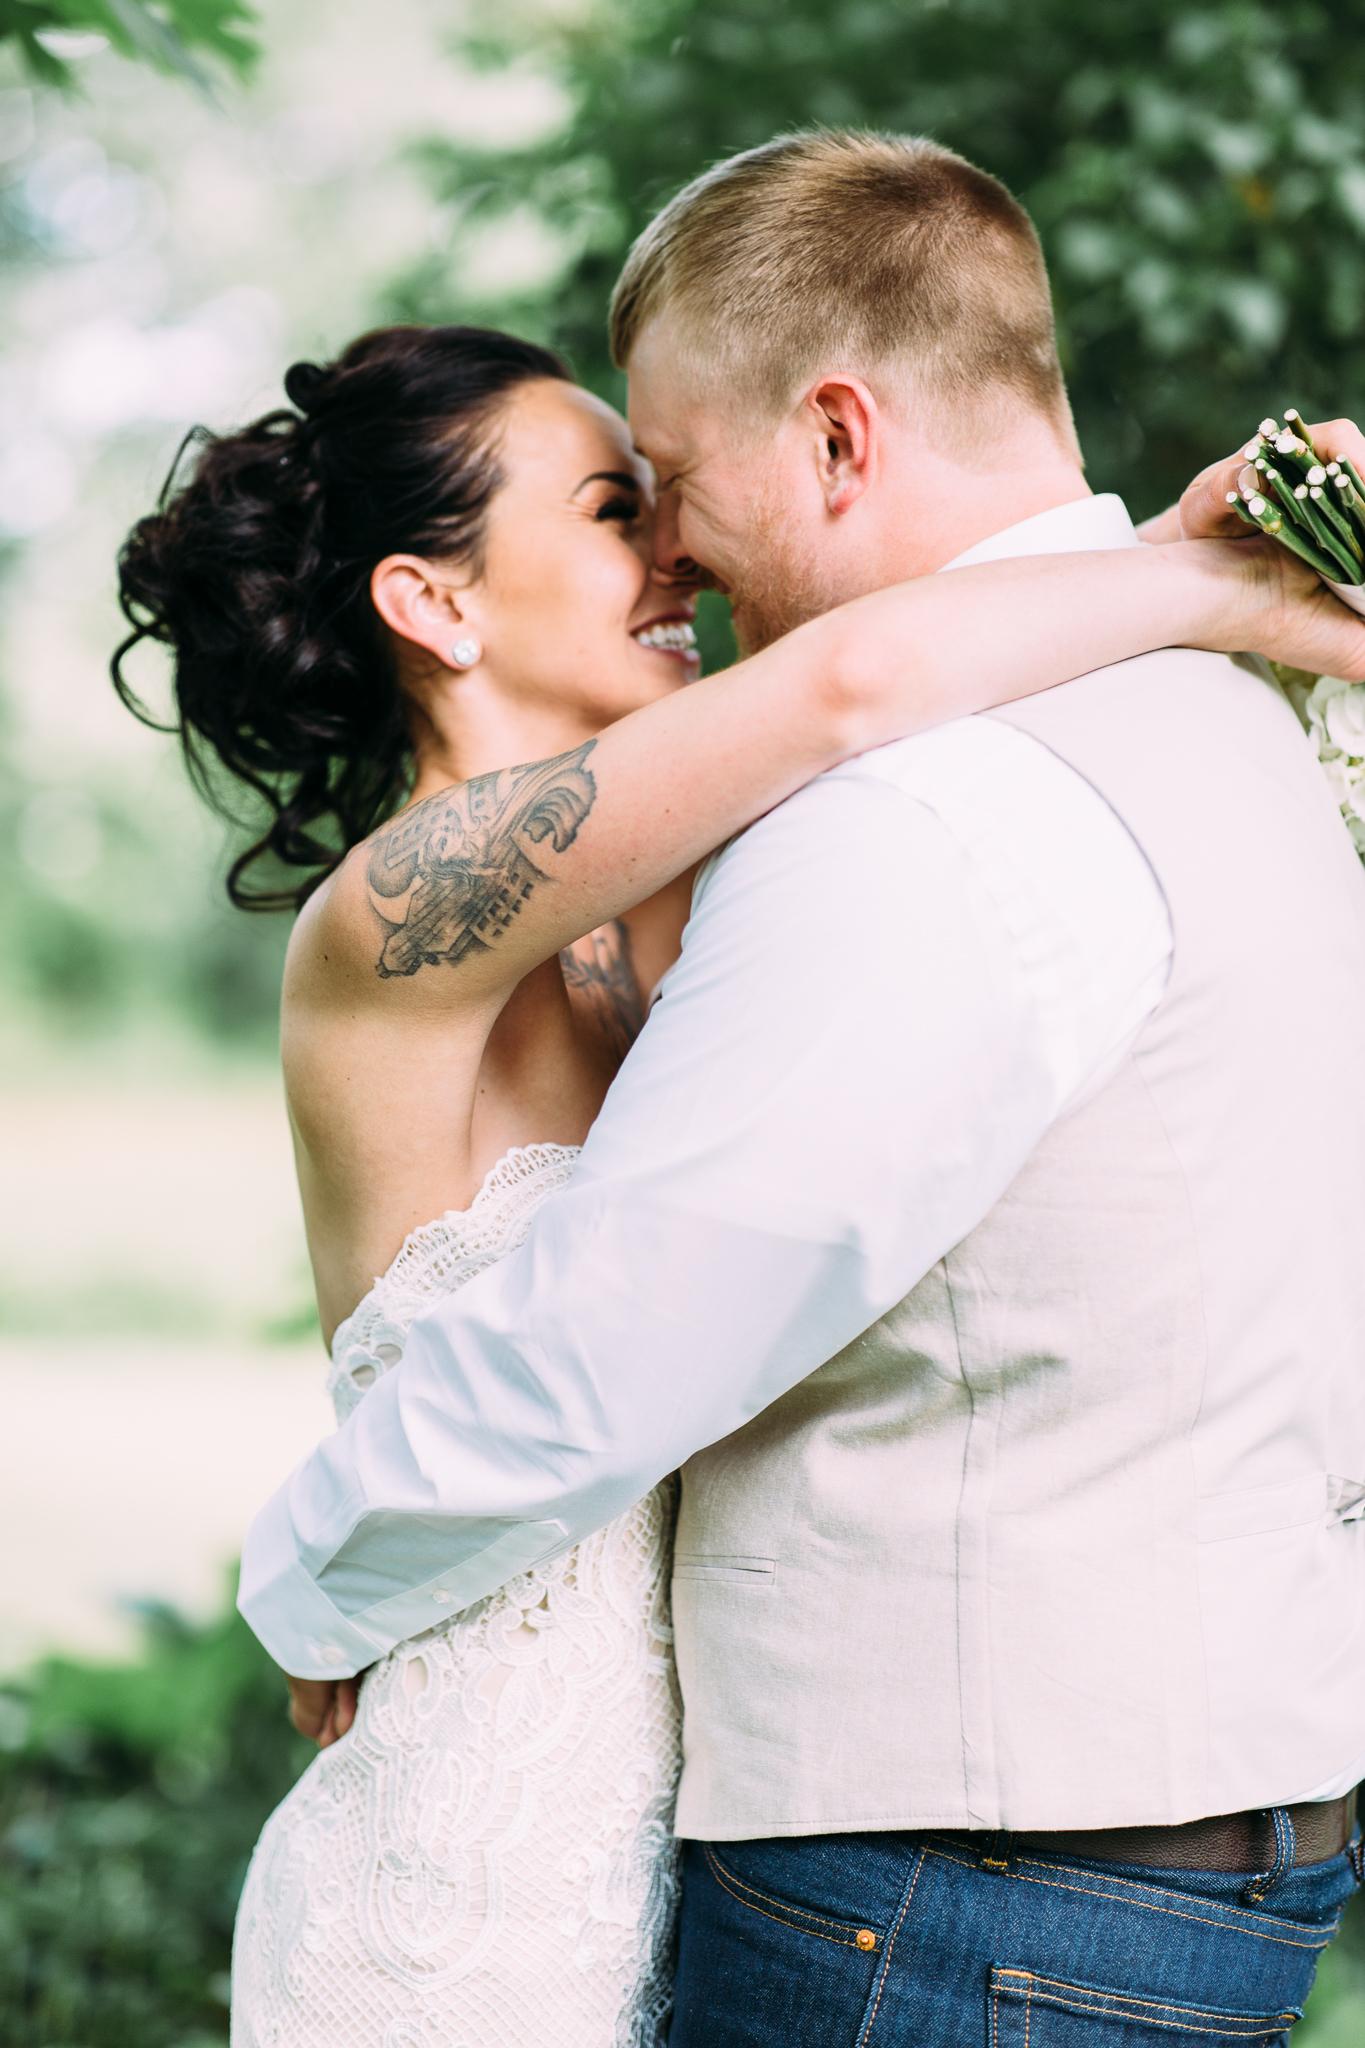 maine-wedding-couple-bride-groom-romantic-photographer.jpg